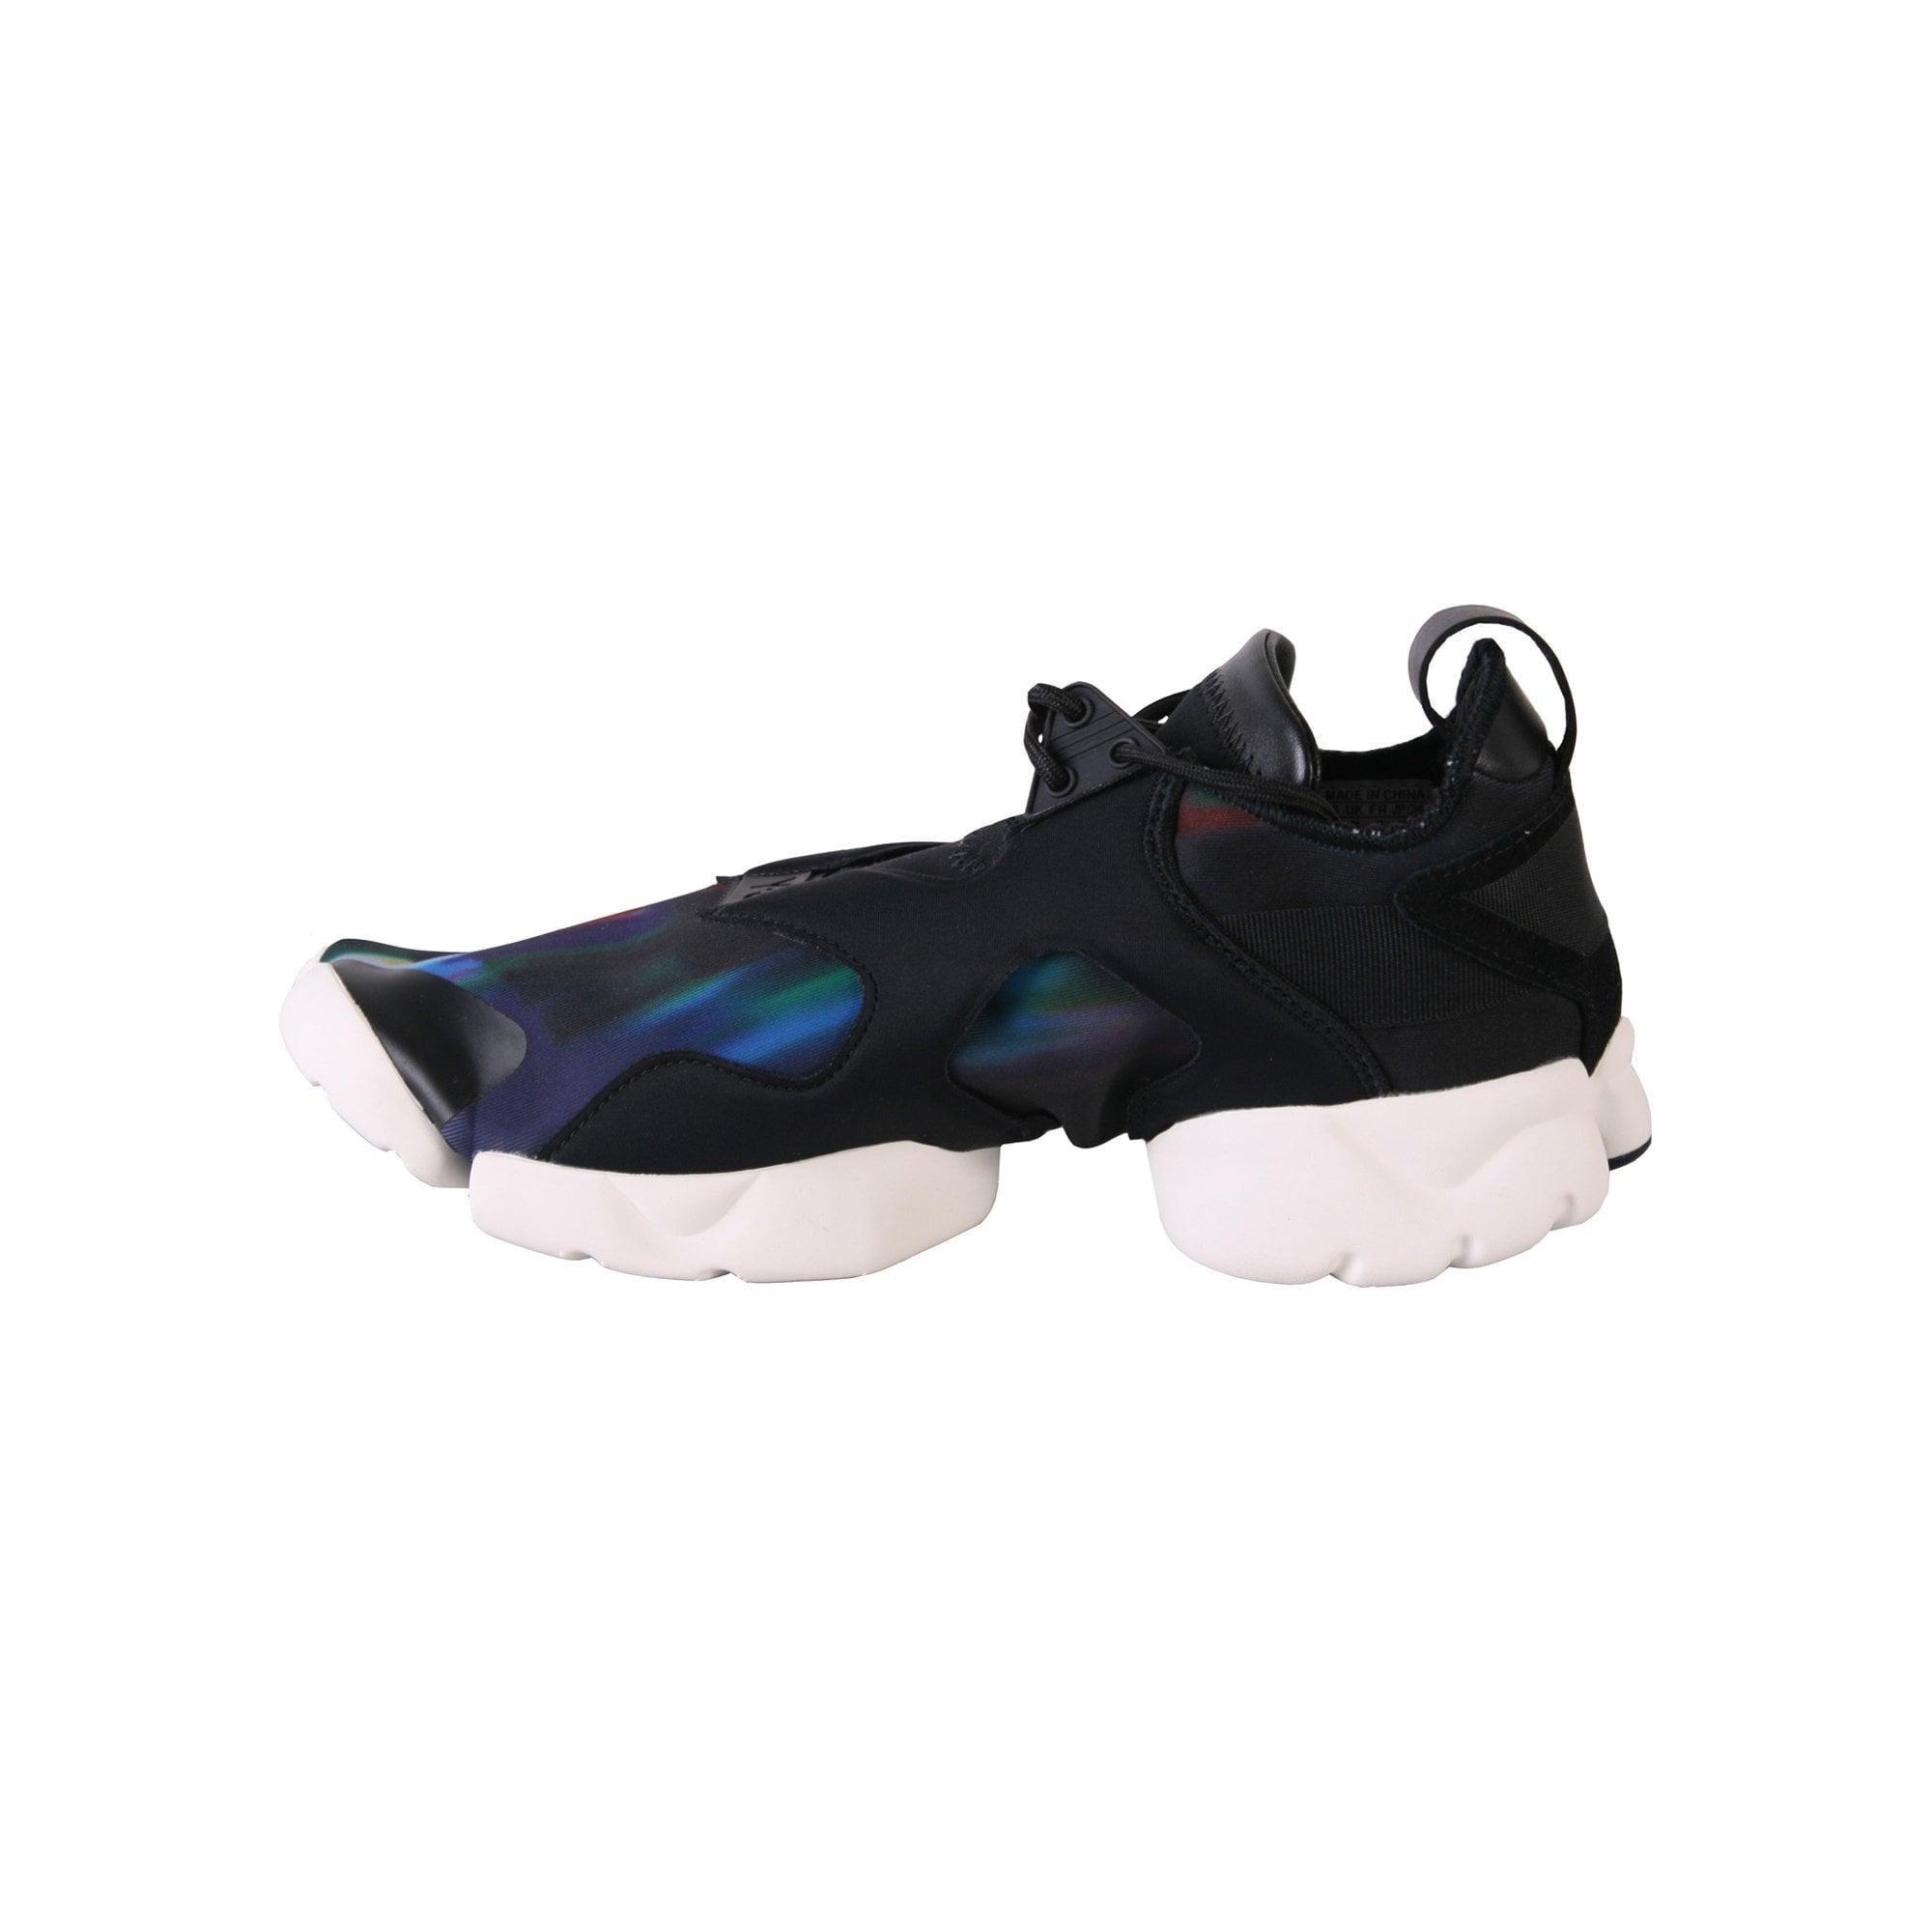 068bd5e8834be ... Y-3 Kohna Sneakers for Men - Lyst. View fullscreen